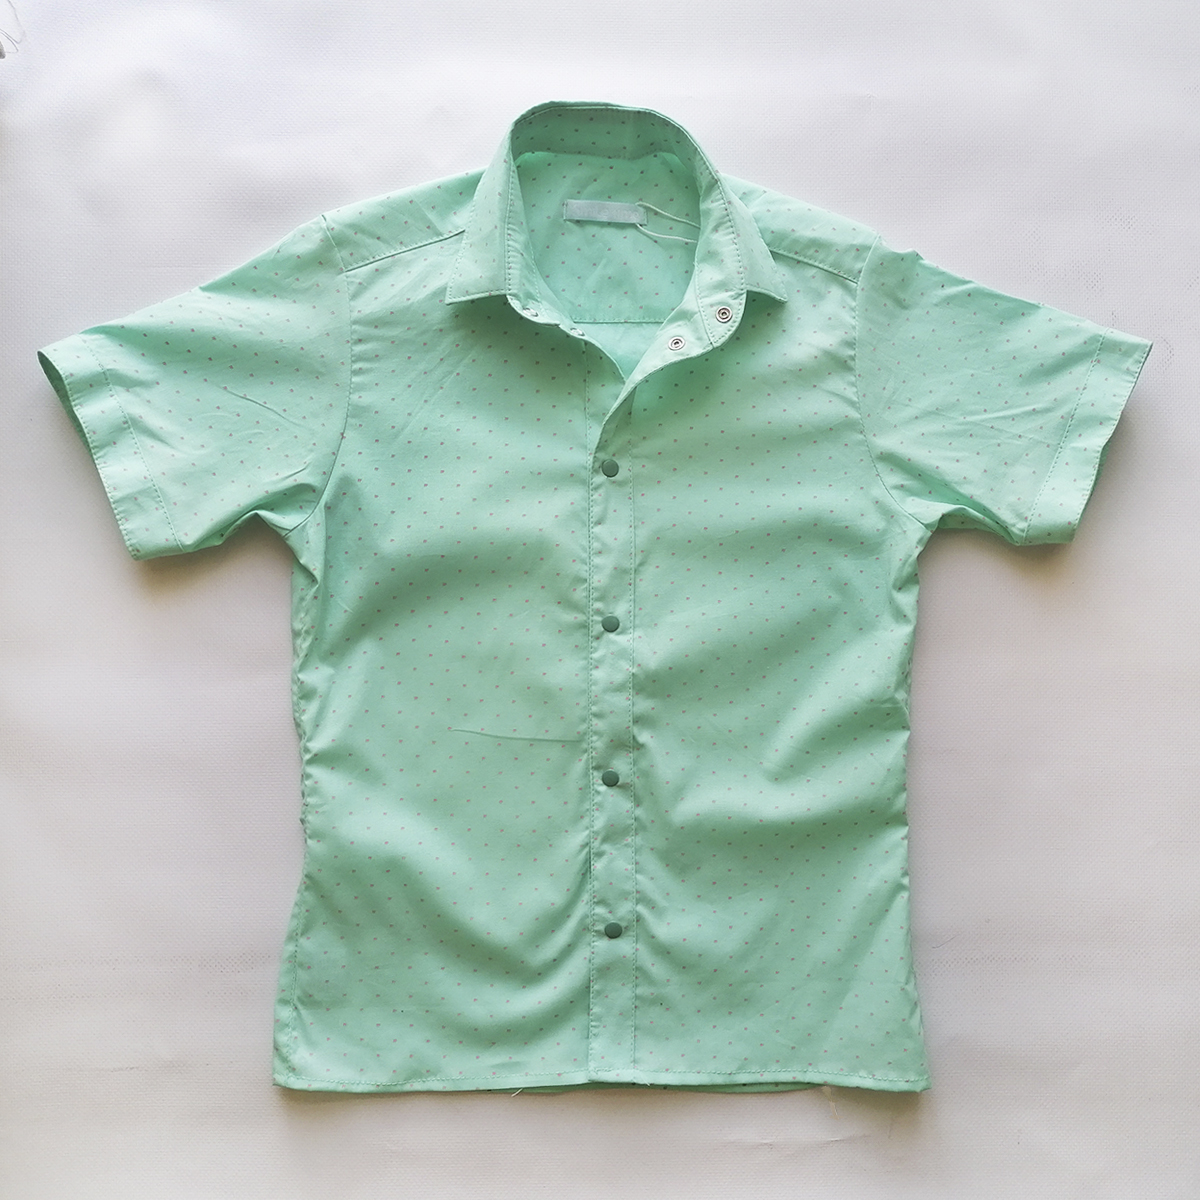 Сорочка з коротким рукавом, для хлопчика, м'ятна SmileTime Touch